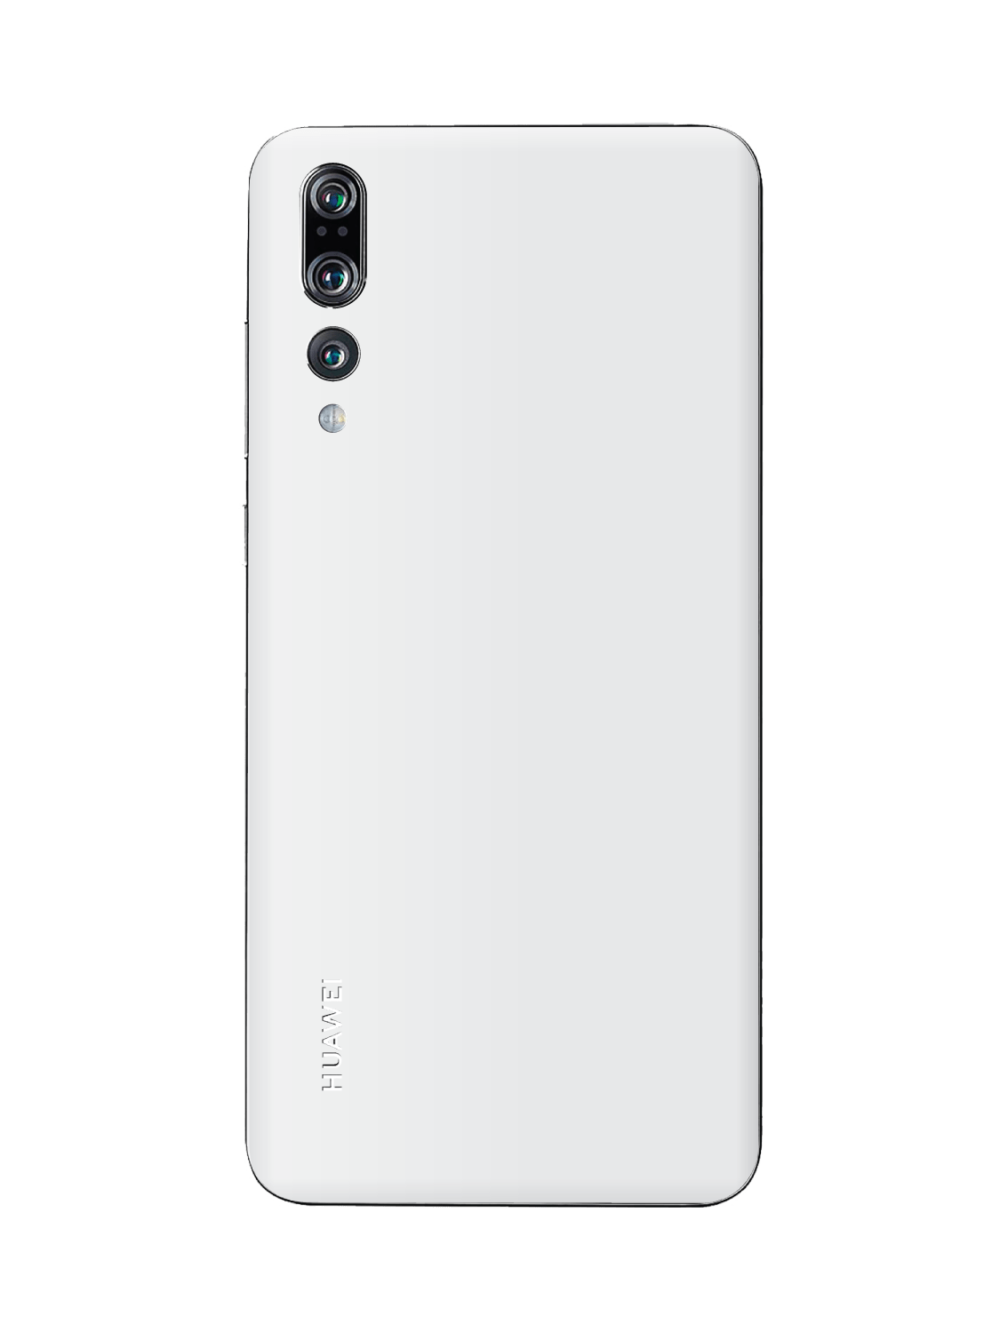 Matt white skin for Huawei P20 Pro